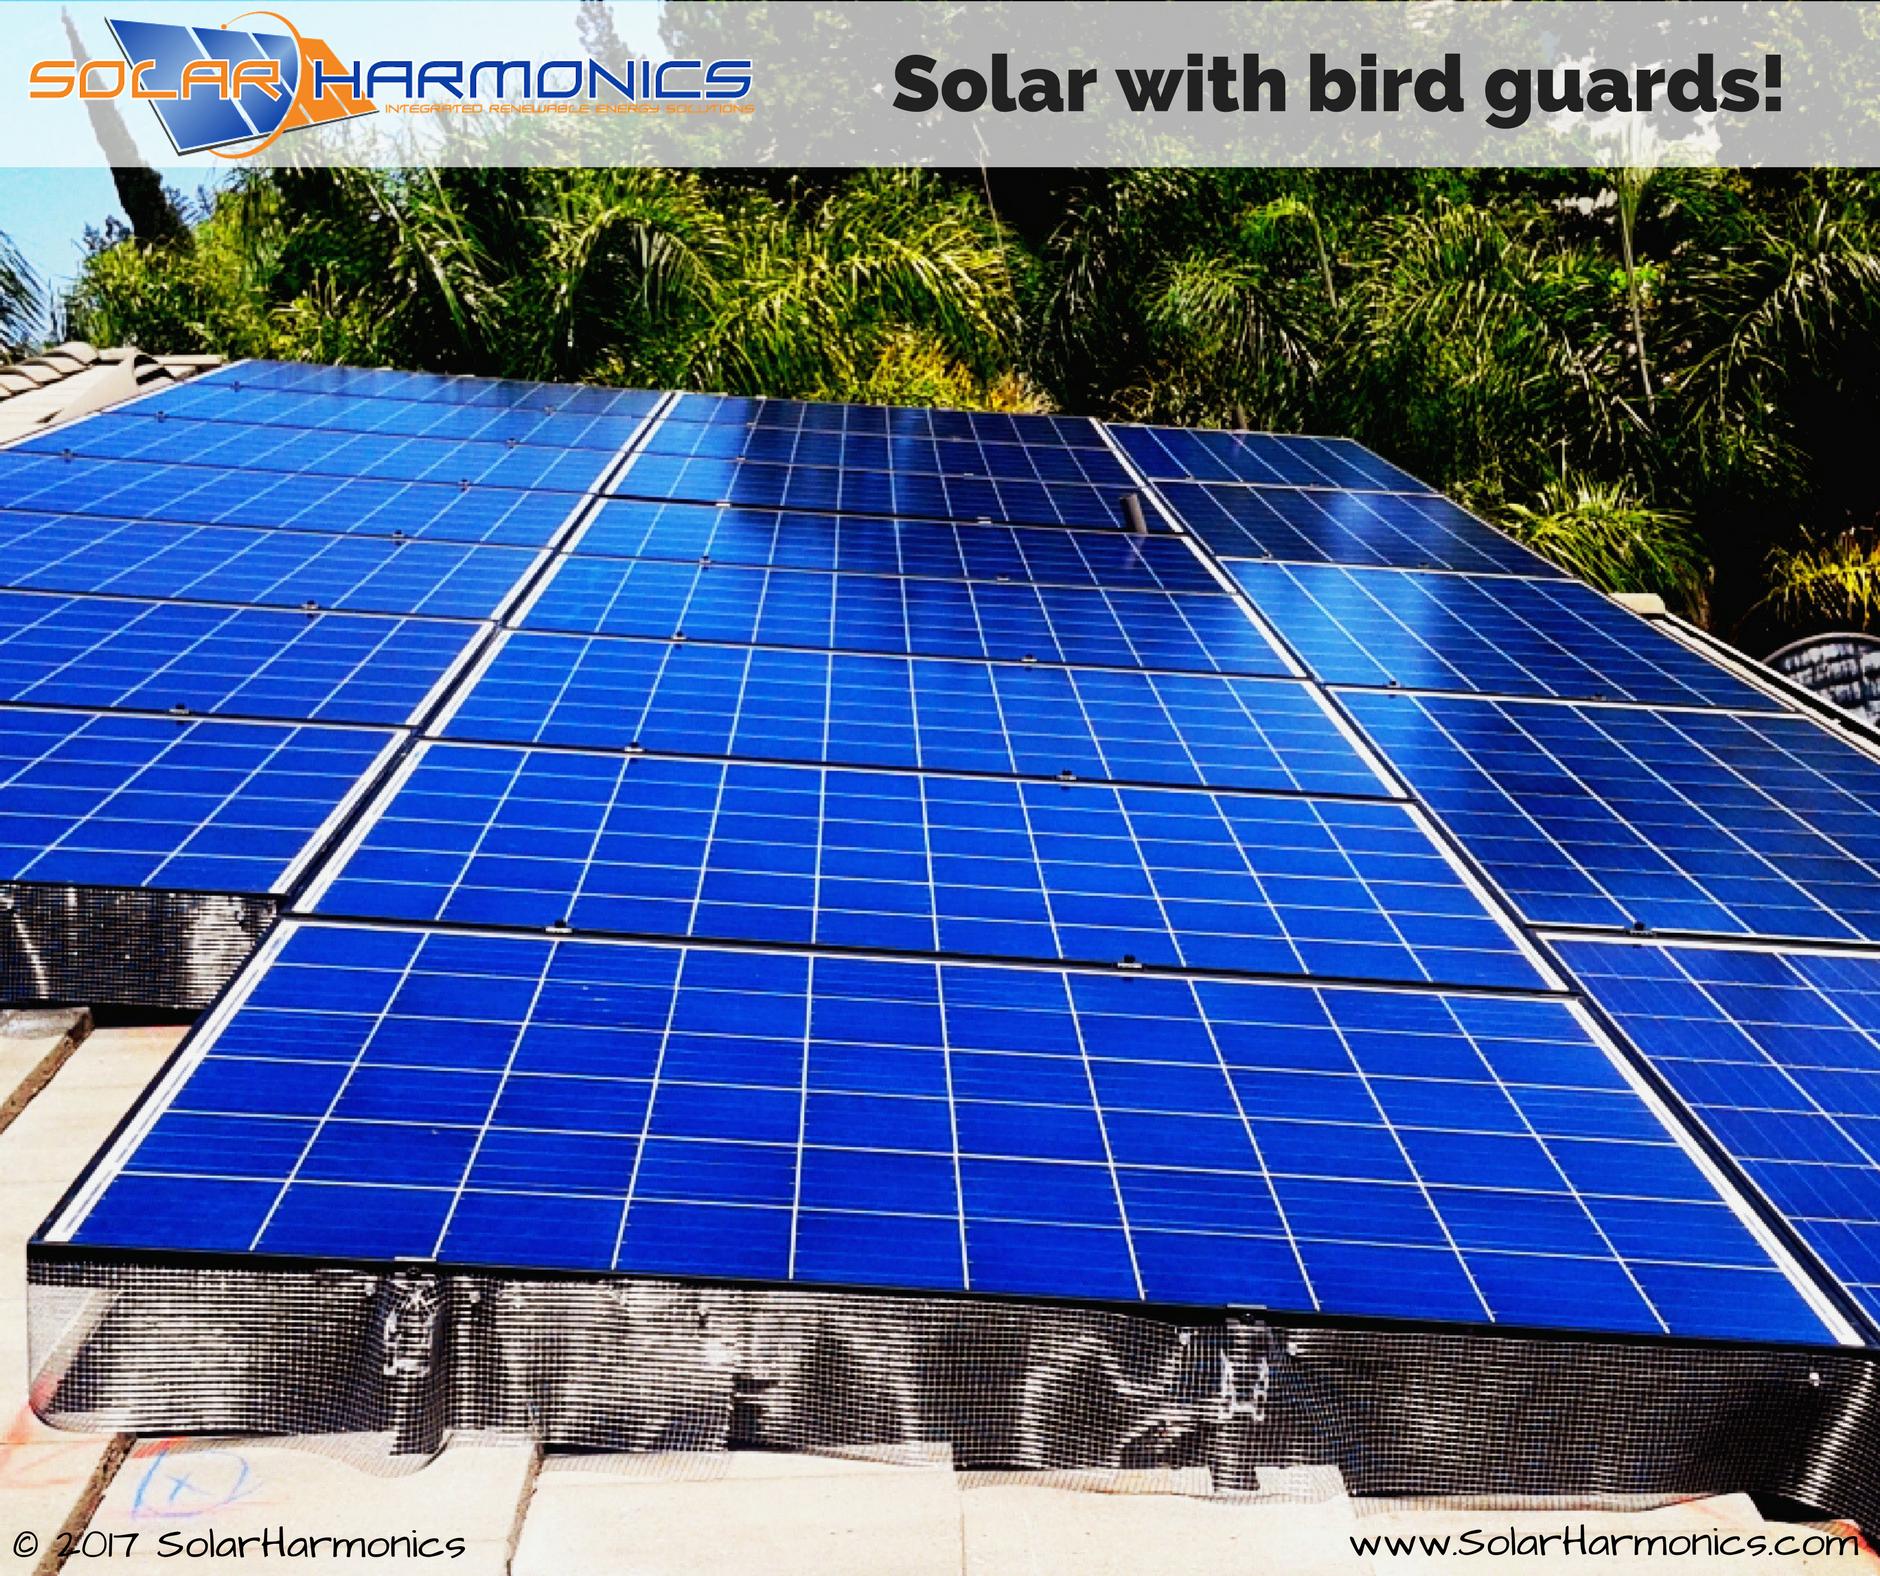 Solar With Bird Guards Antioch Panel Installation Solar Installation Solar Roof Solar Panel